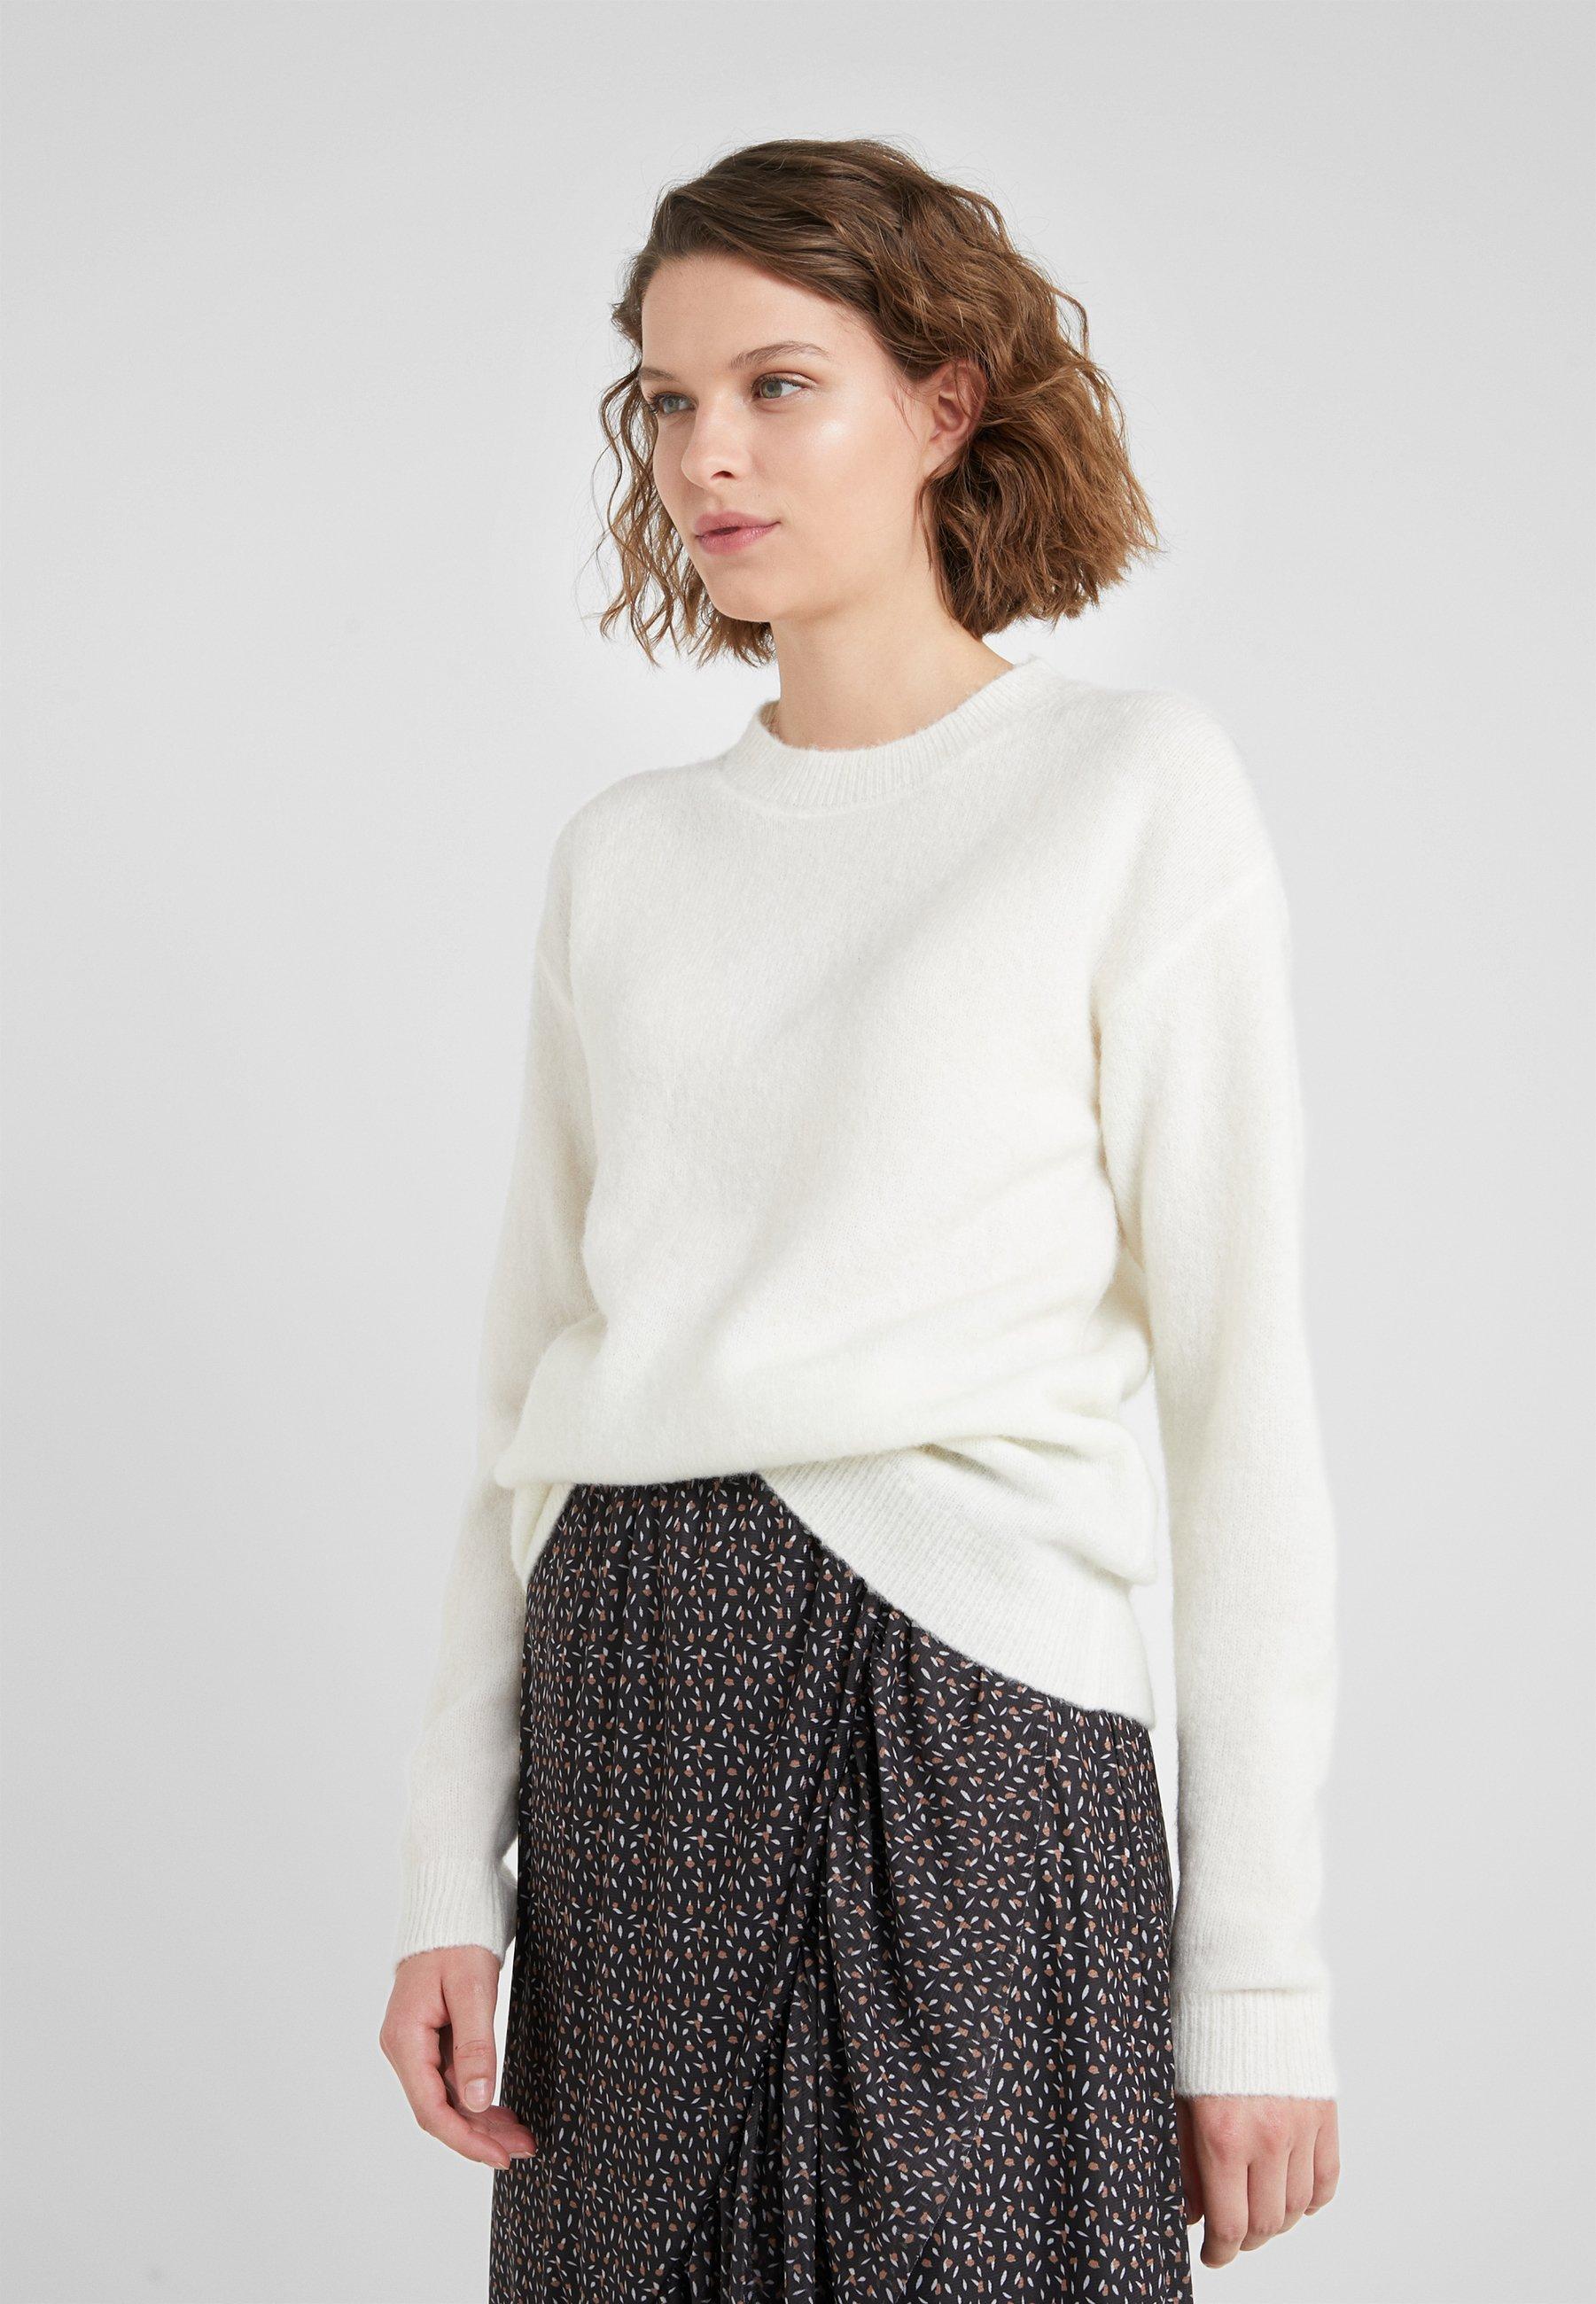 Femme HOLLY JOHANNE  - Pullover